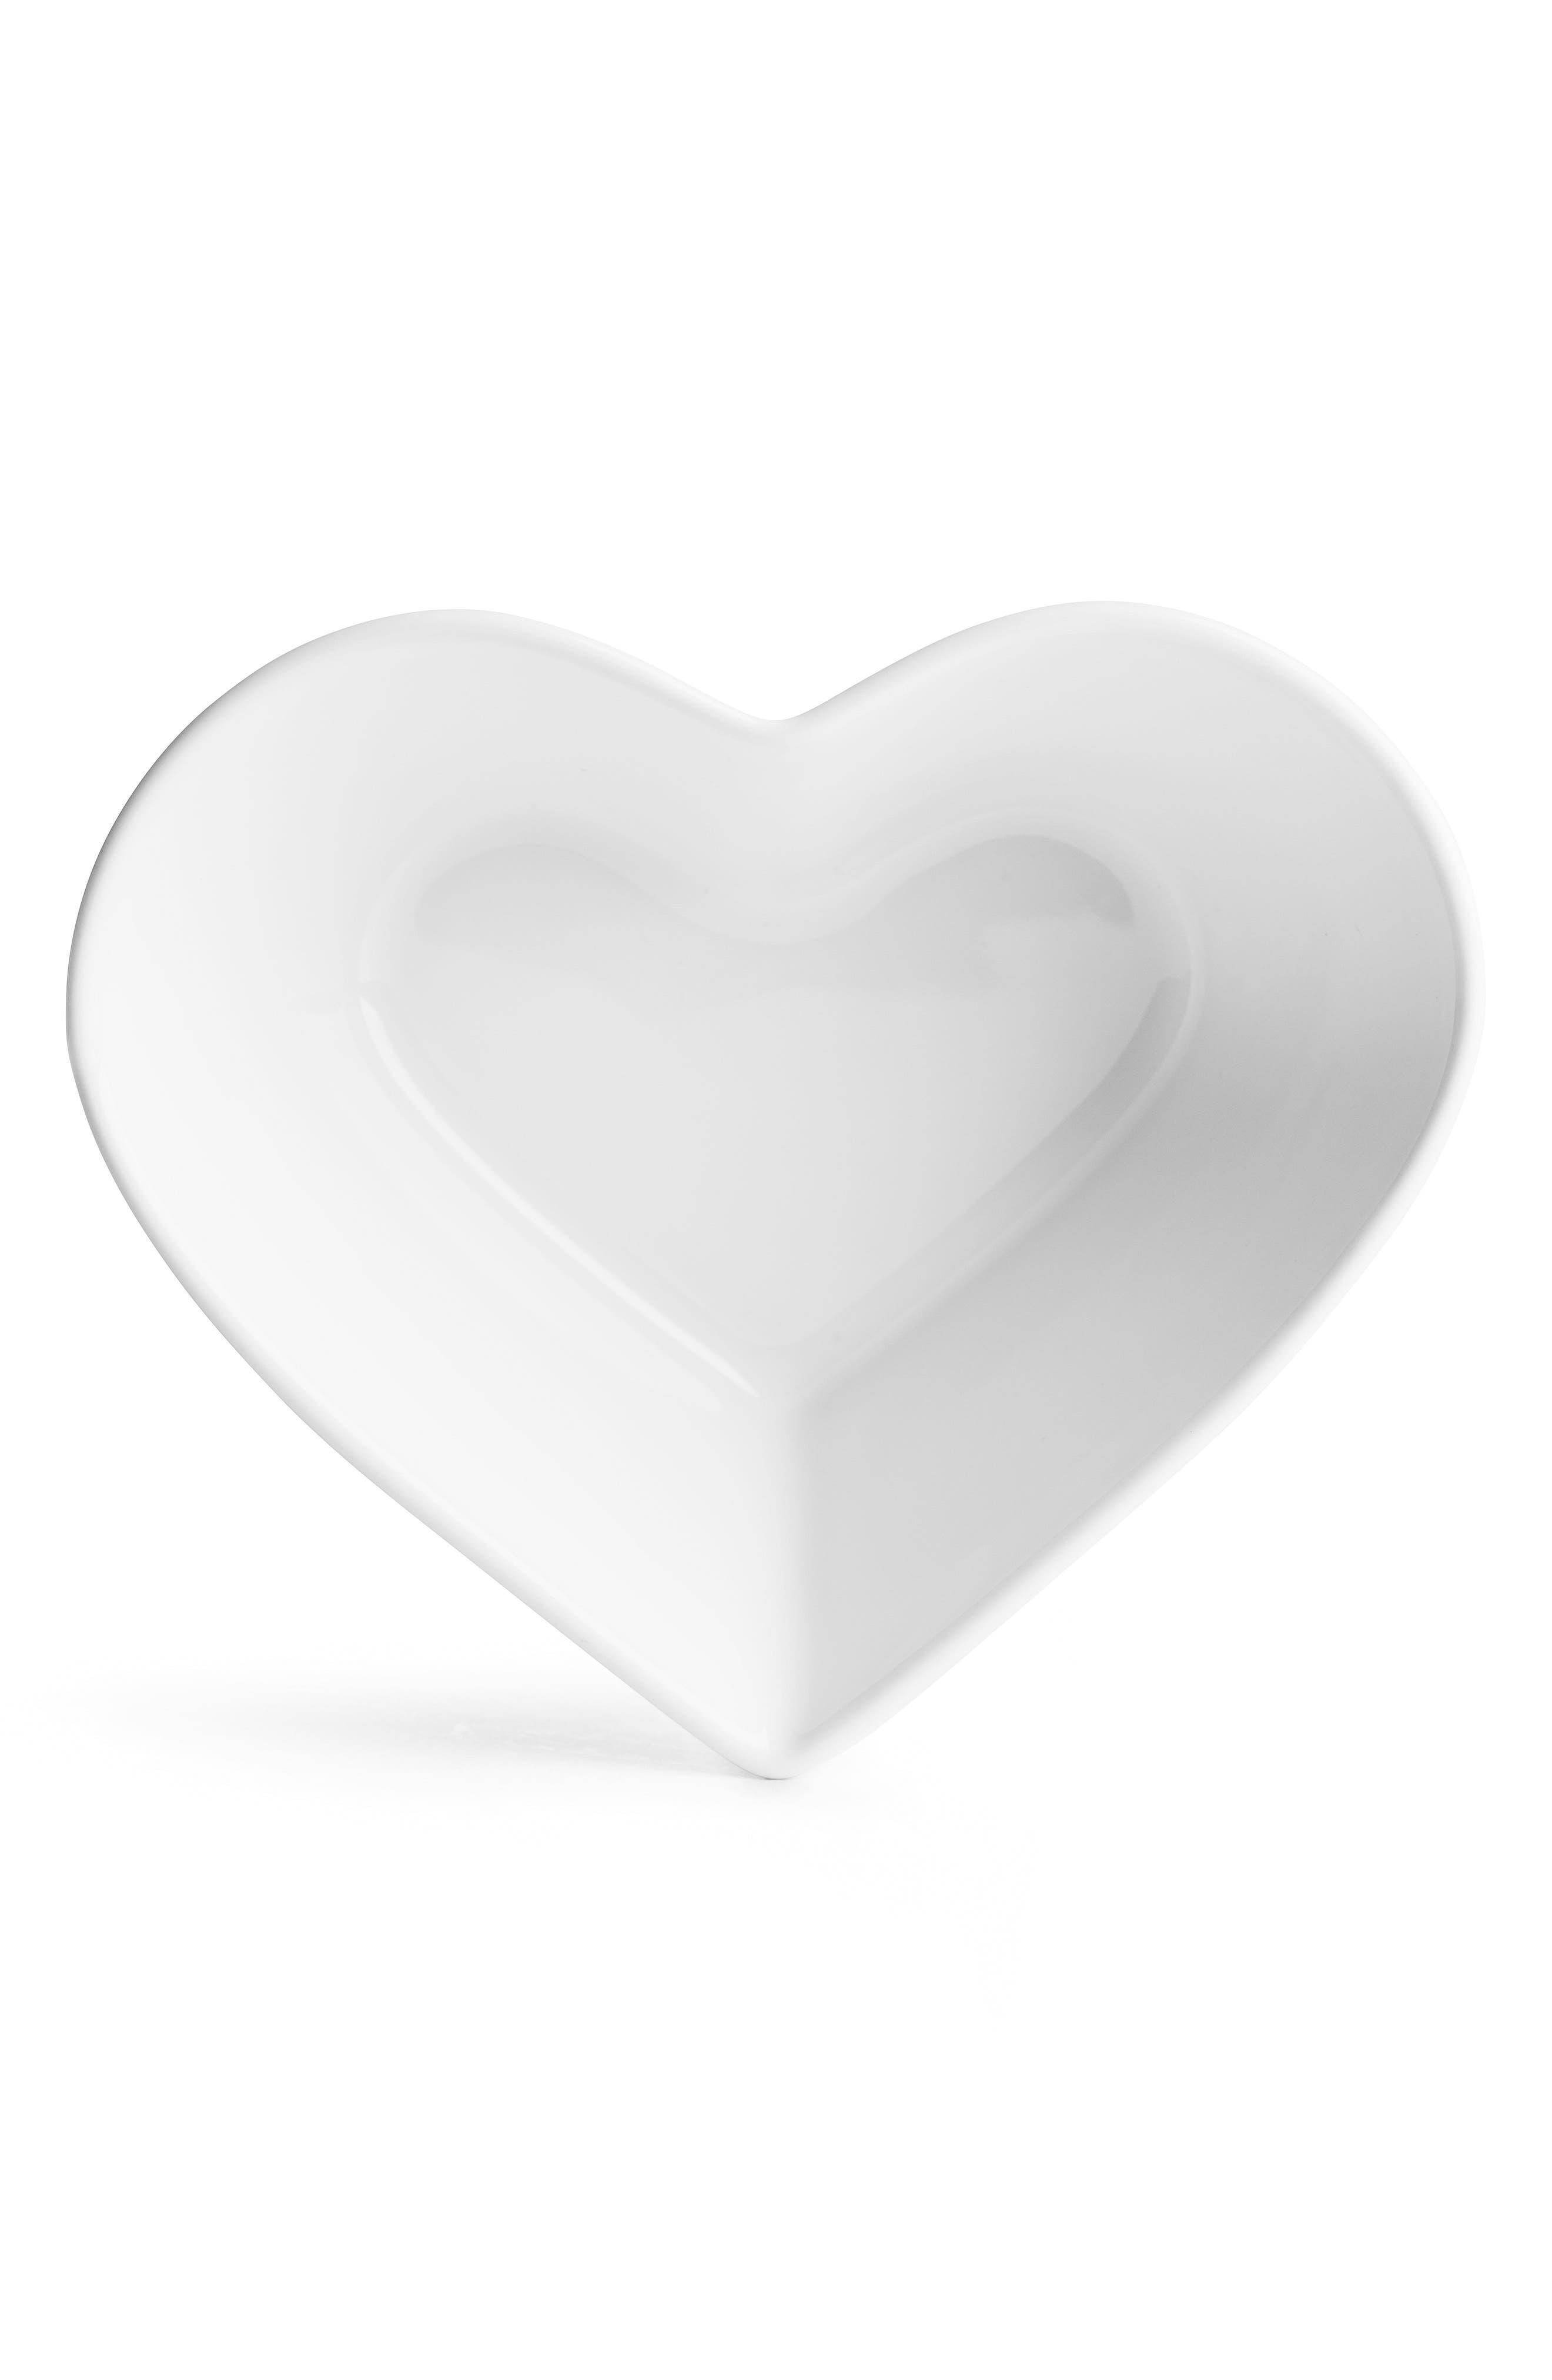 Heart Serving Bowl, Main, color, WHITE